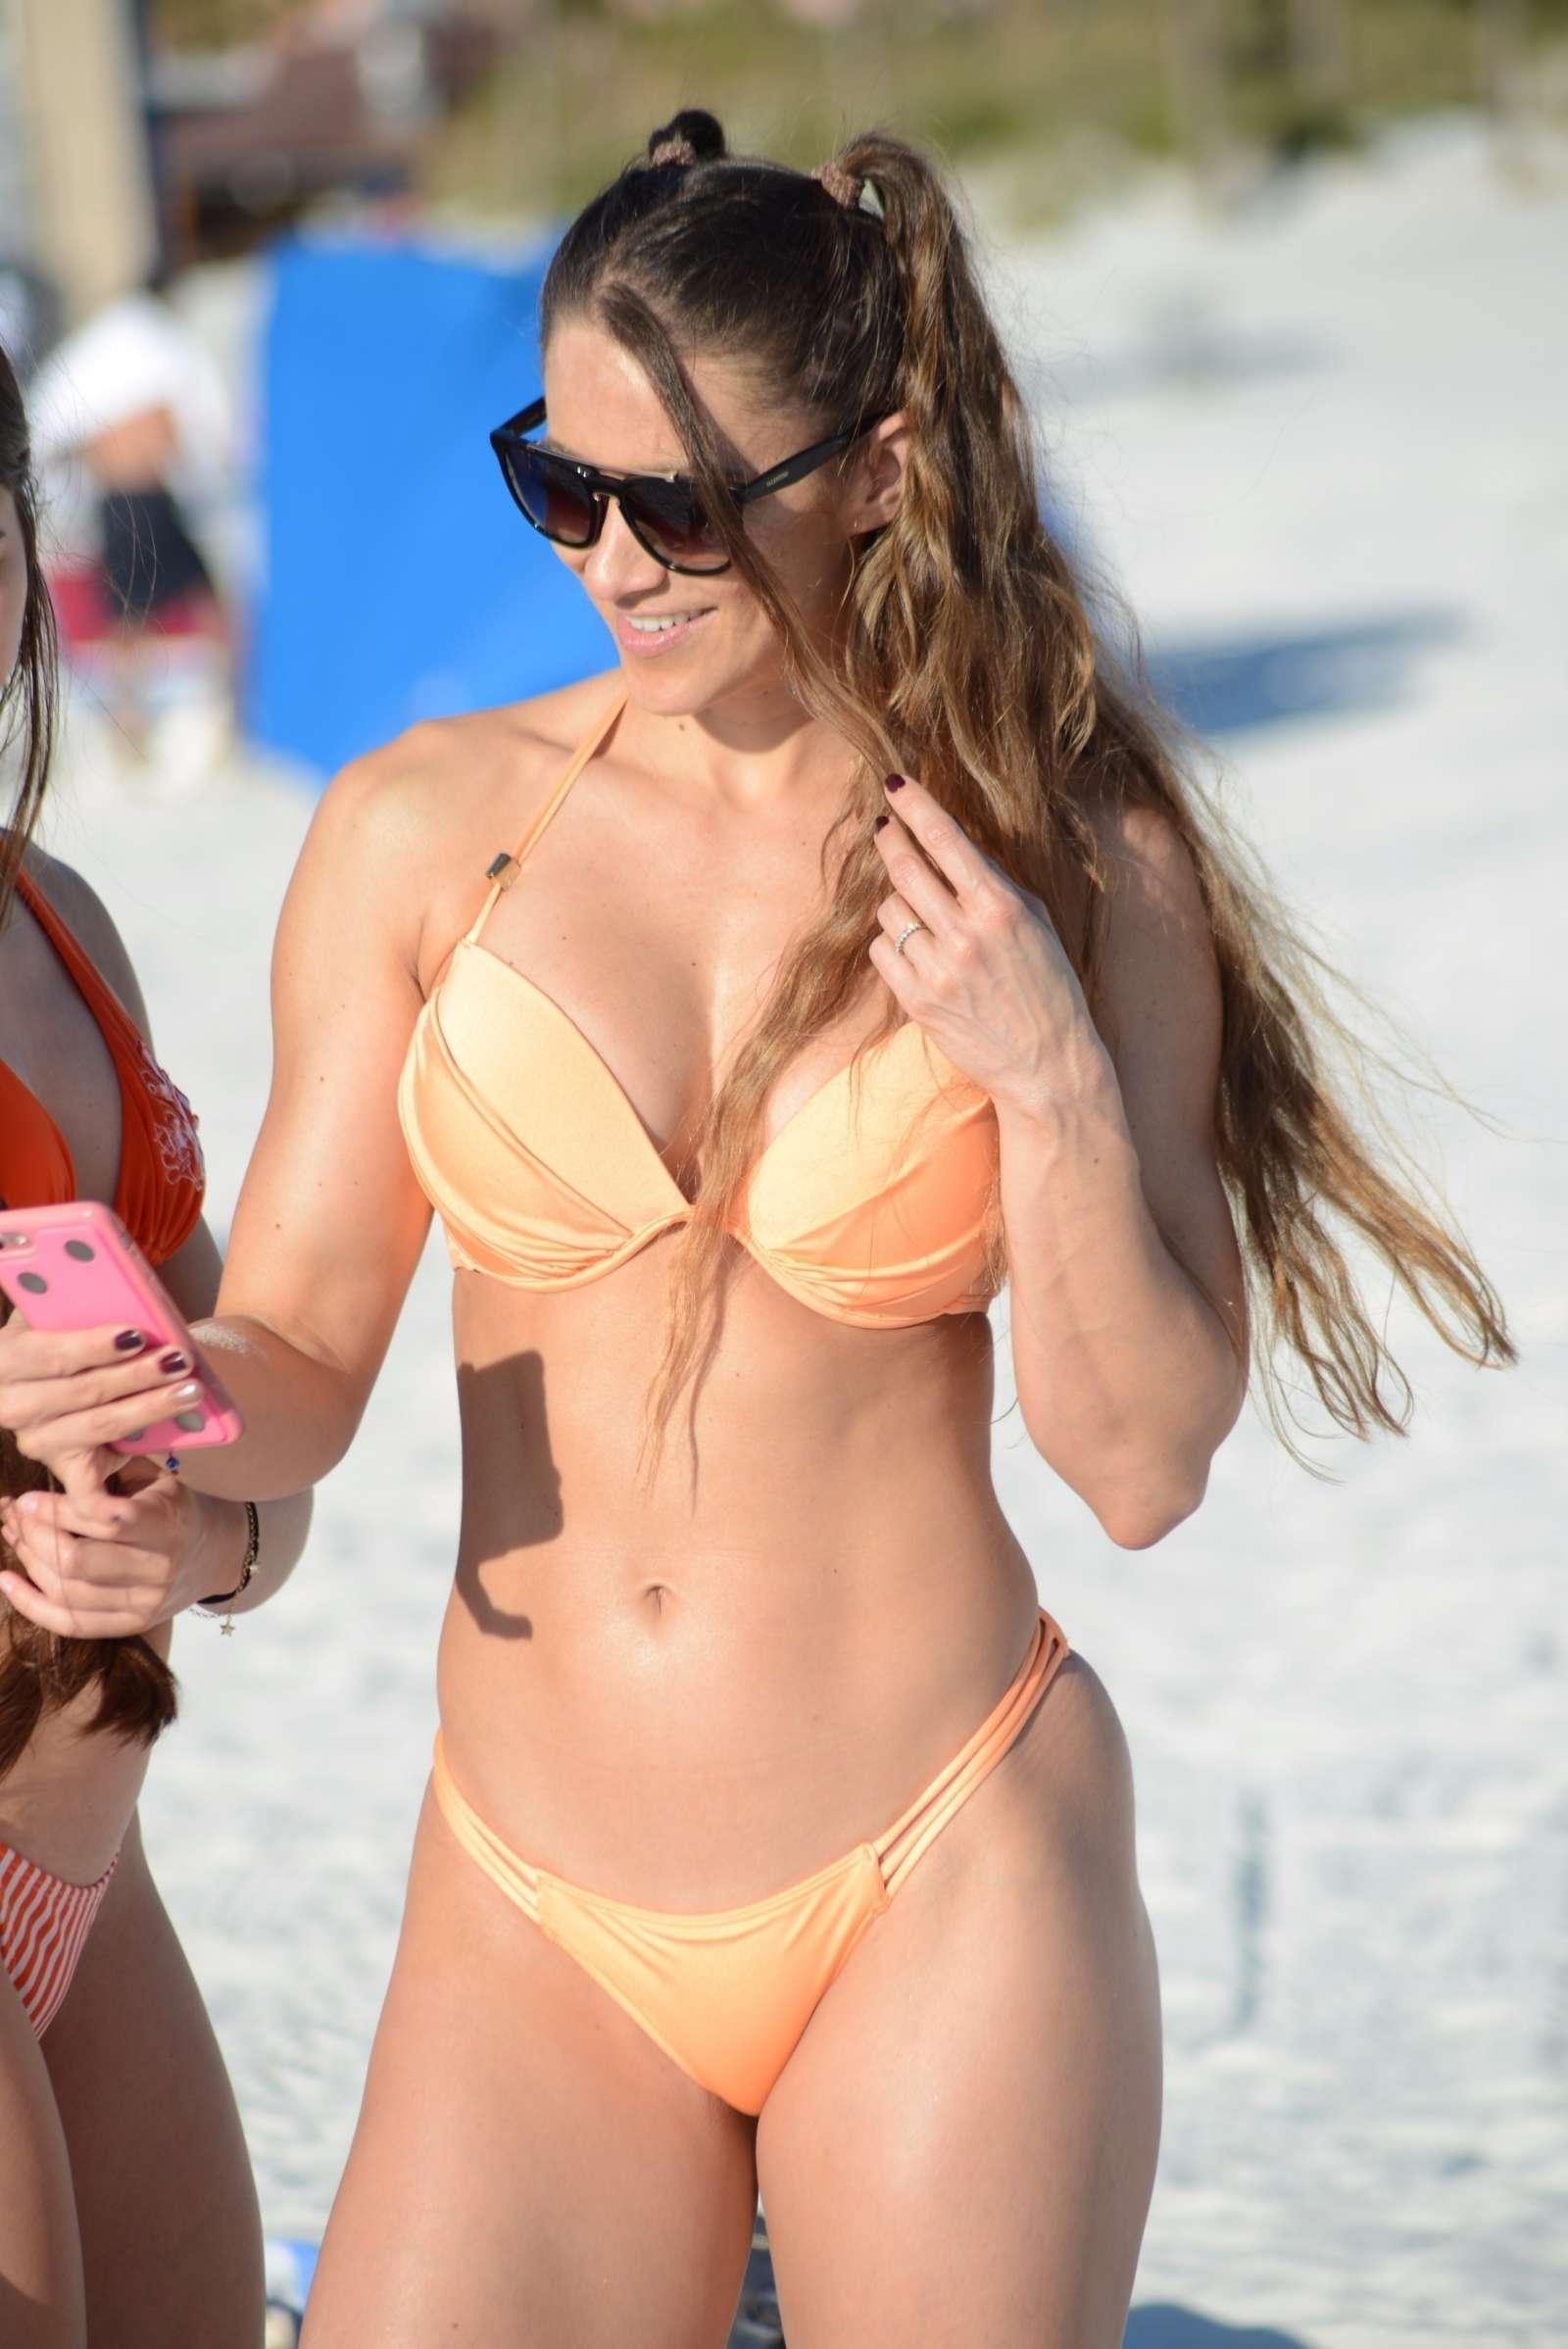 Photos Nicole Caridad nudes (55 photos), Pussy, Leaked, Instagram, braless 2006